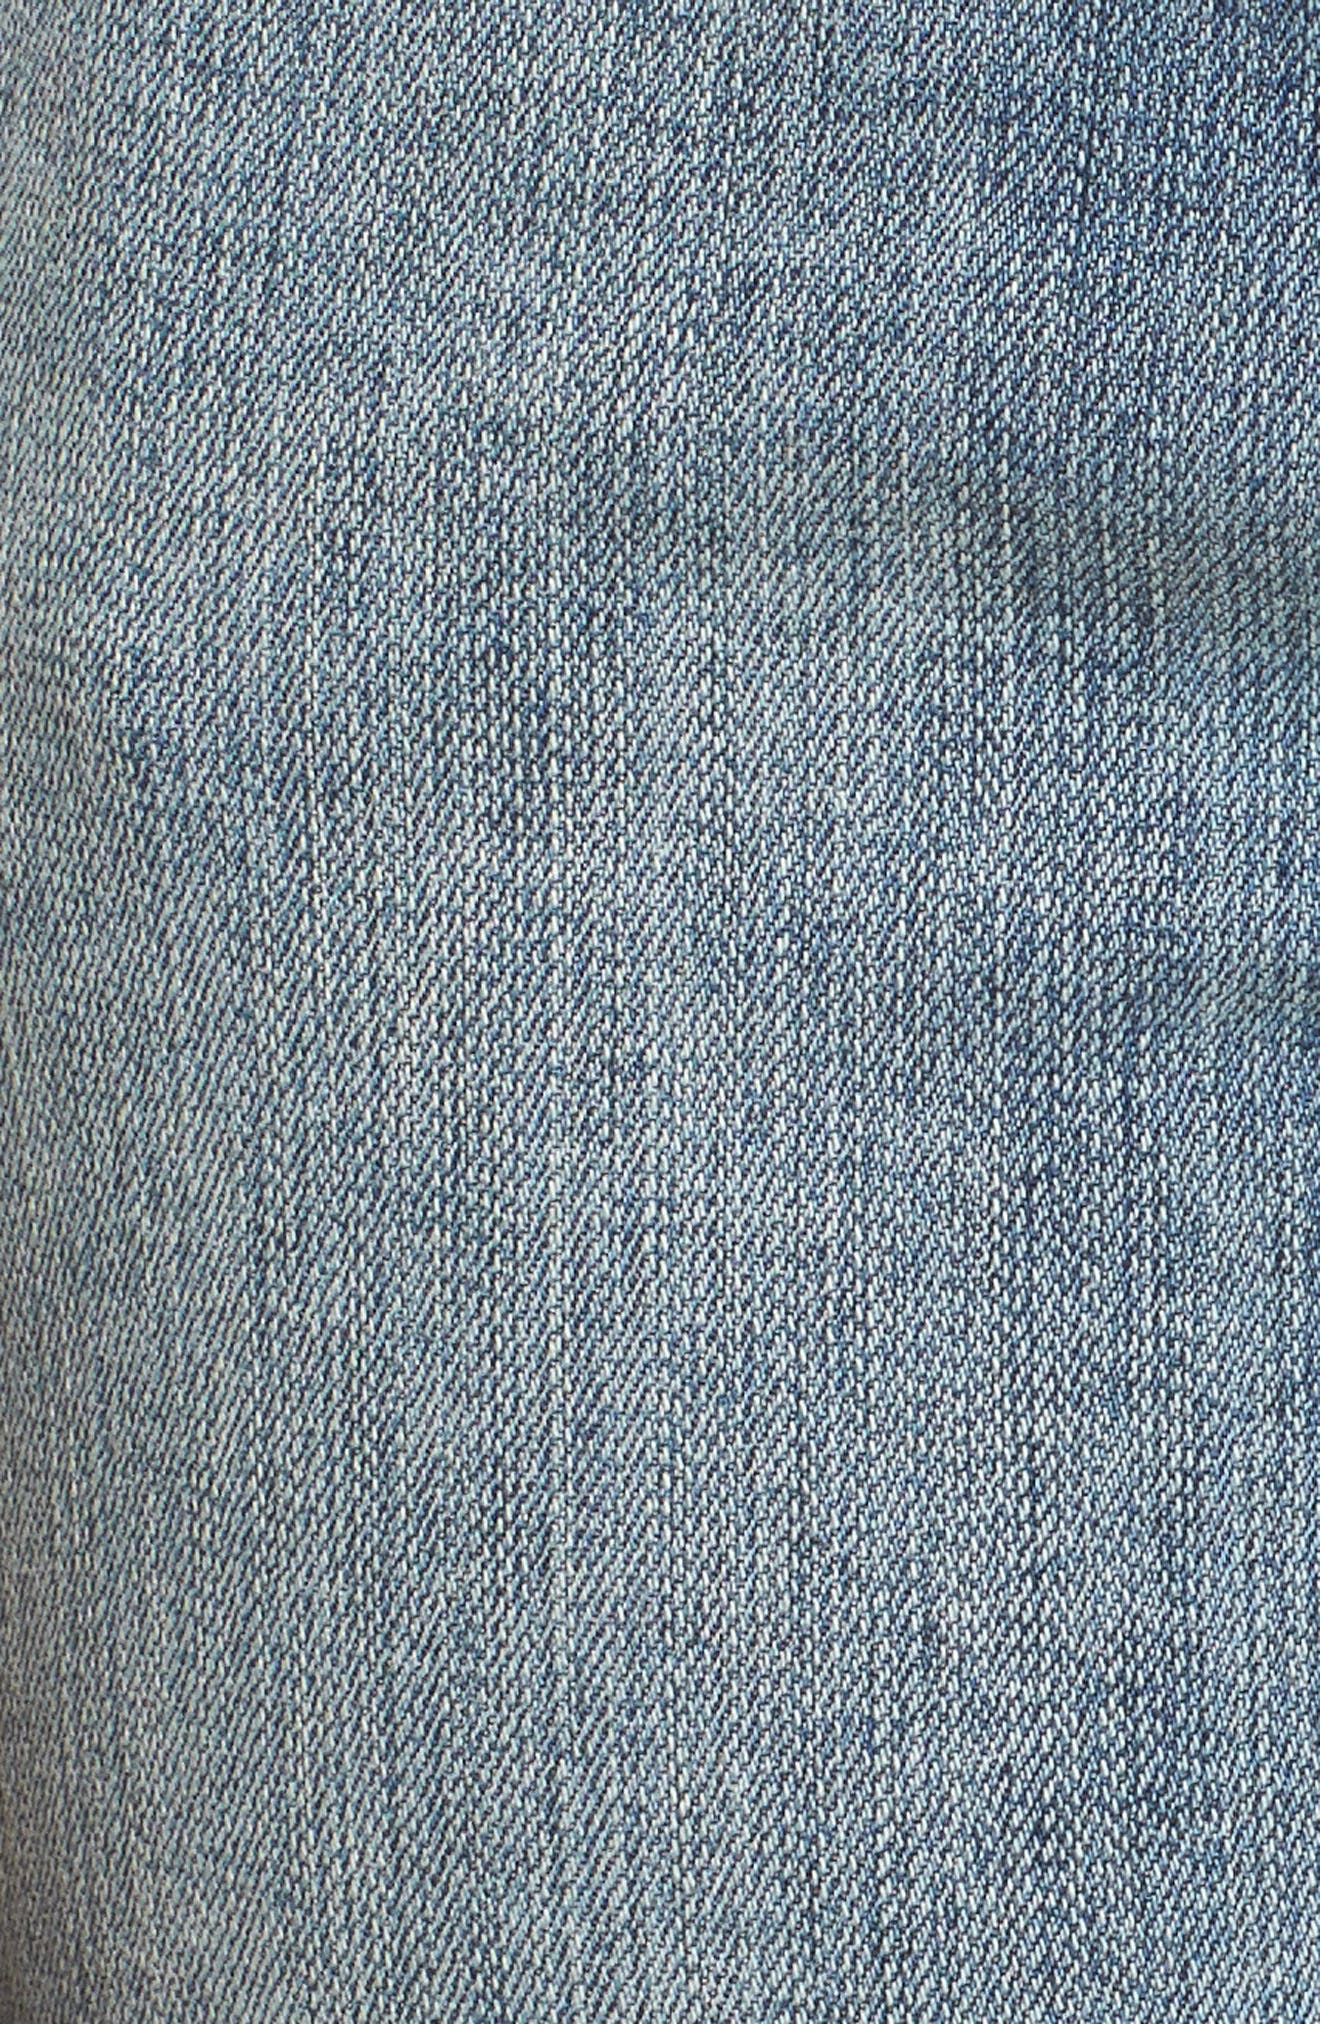 Embroidered Seam Boyfriend Denim Shorts,                             Alternate thumbnail 5, color,                             420